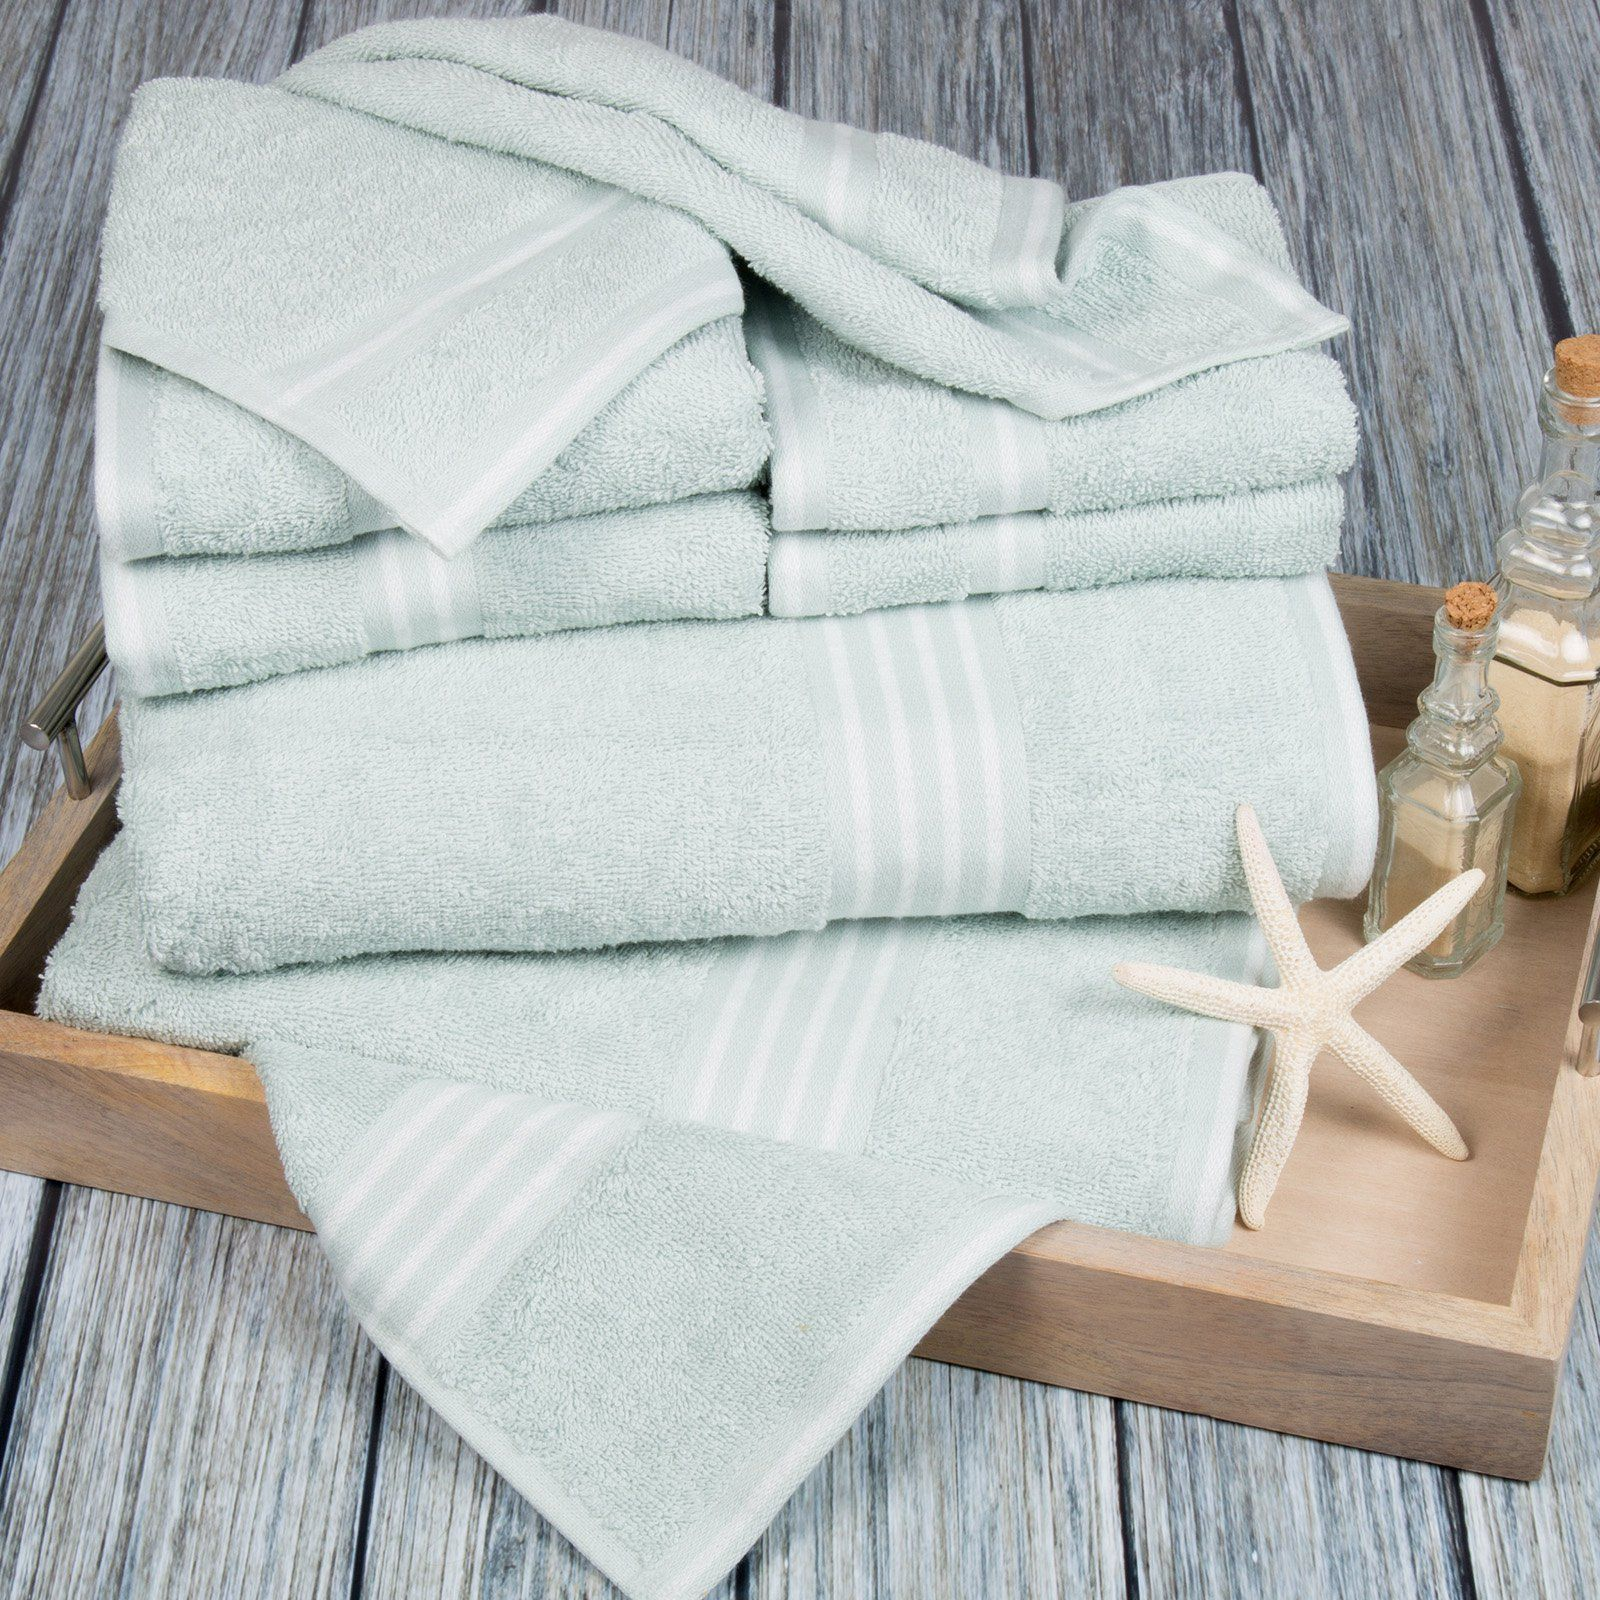 Lavish Home Rio 8 Piece Egyptian Cotton Towel Set Seafoam Egyptian Cotton Towels Towel Set Cotton Towels